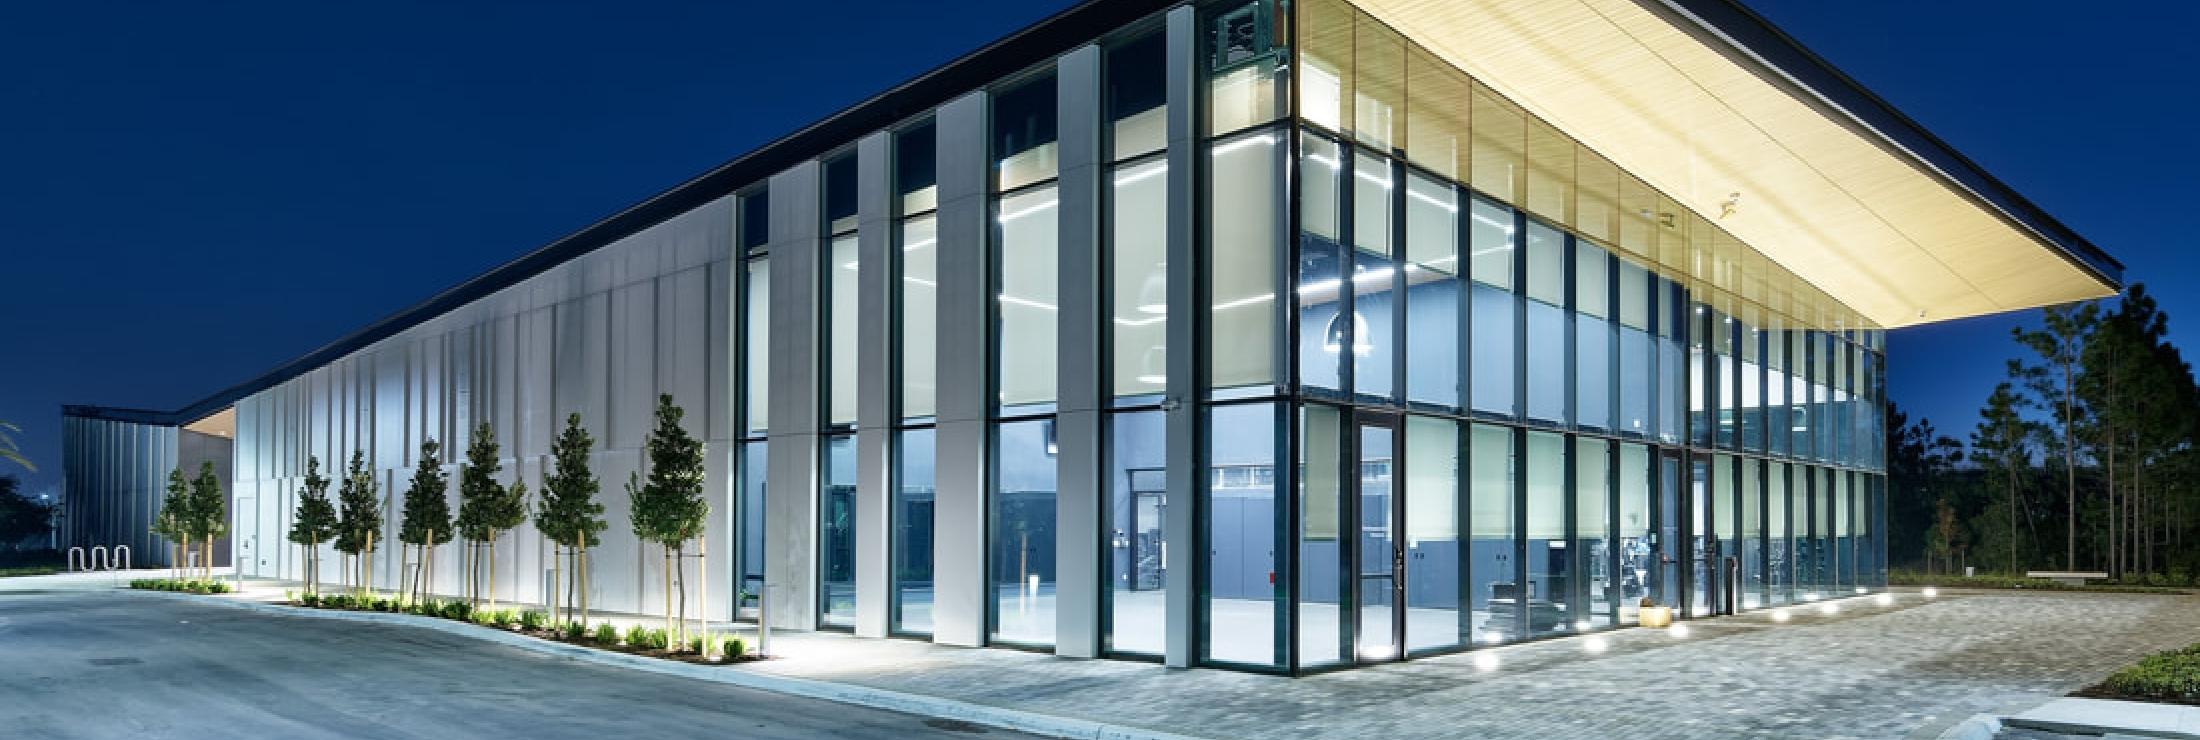 Human Performance Institute - Cladding Corp Swisspearl Fiber Cement Rainscreens